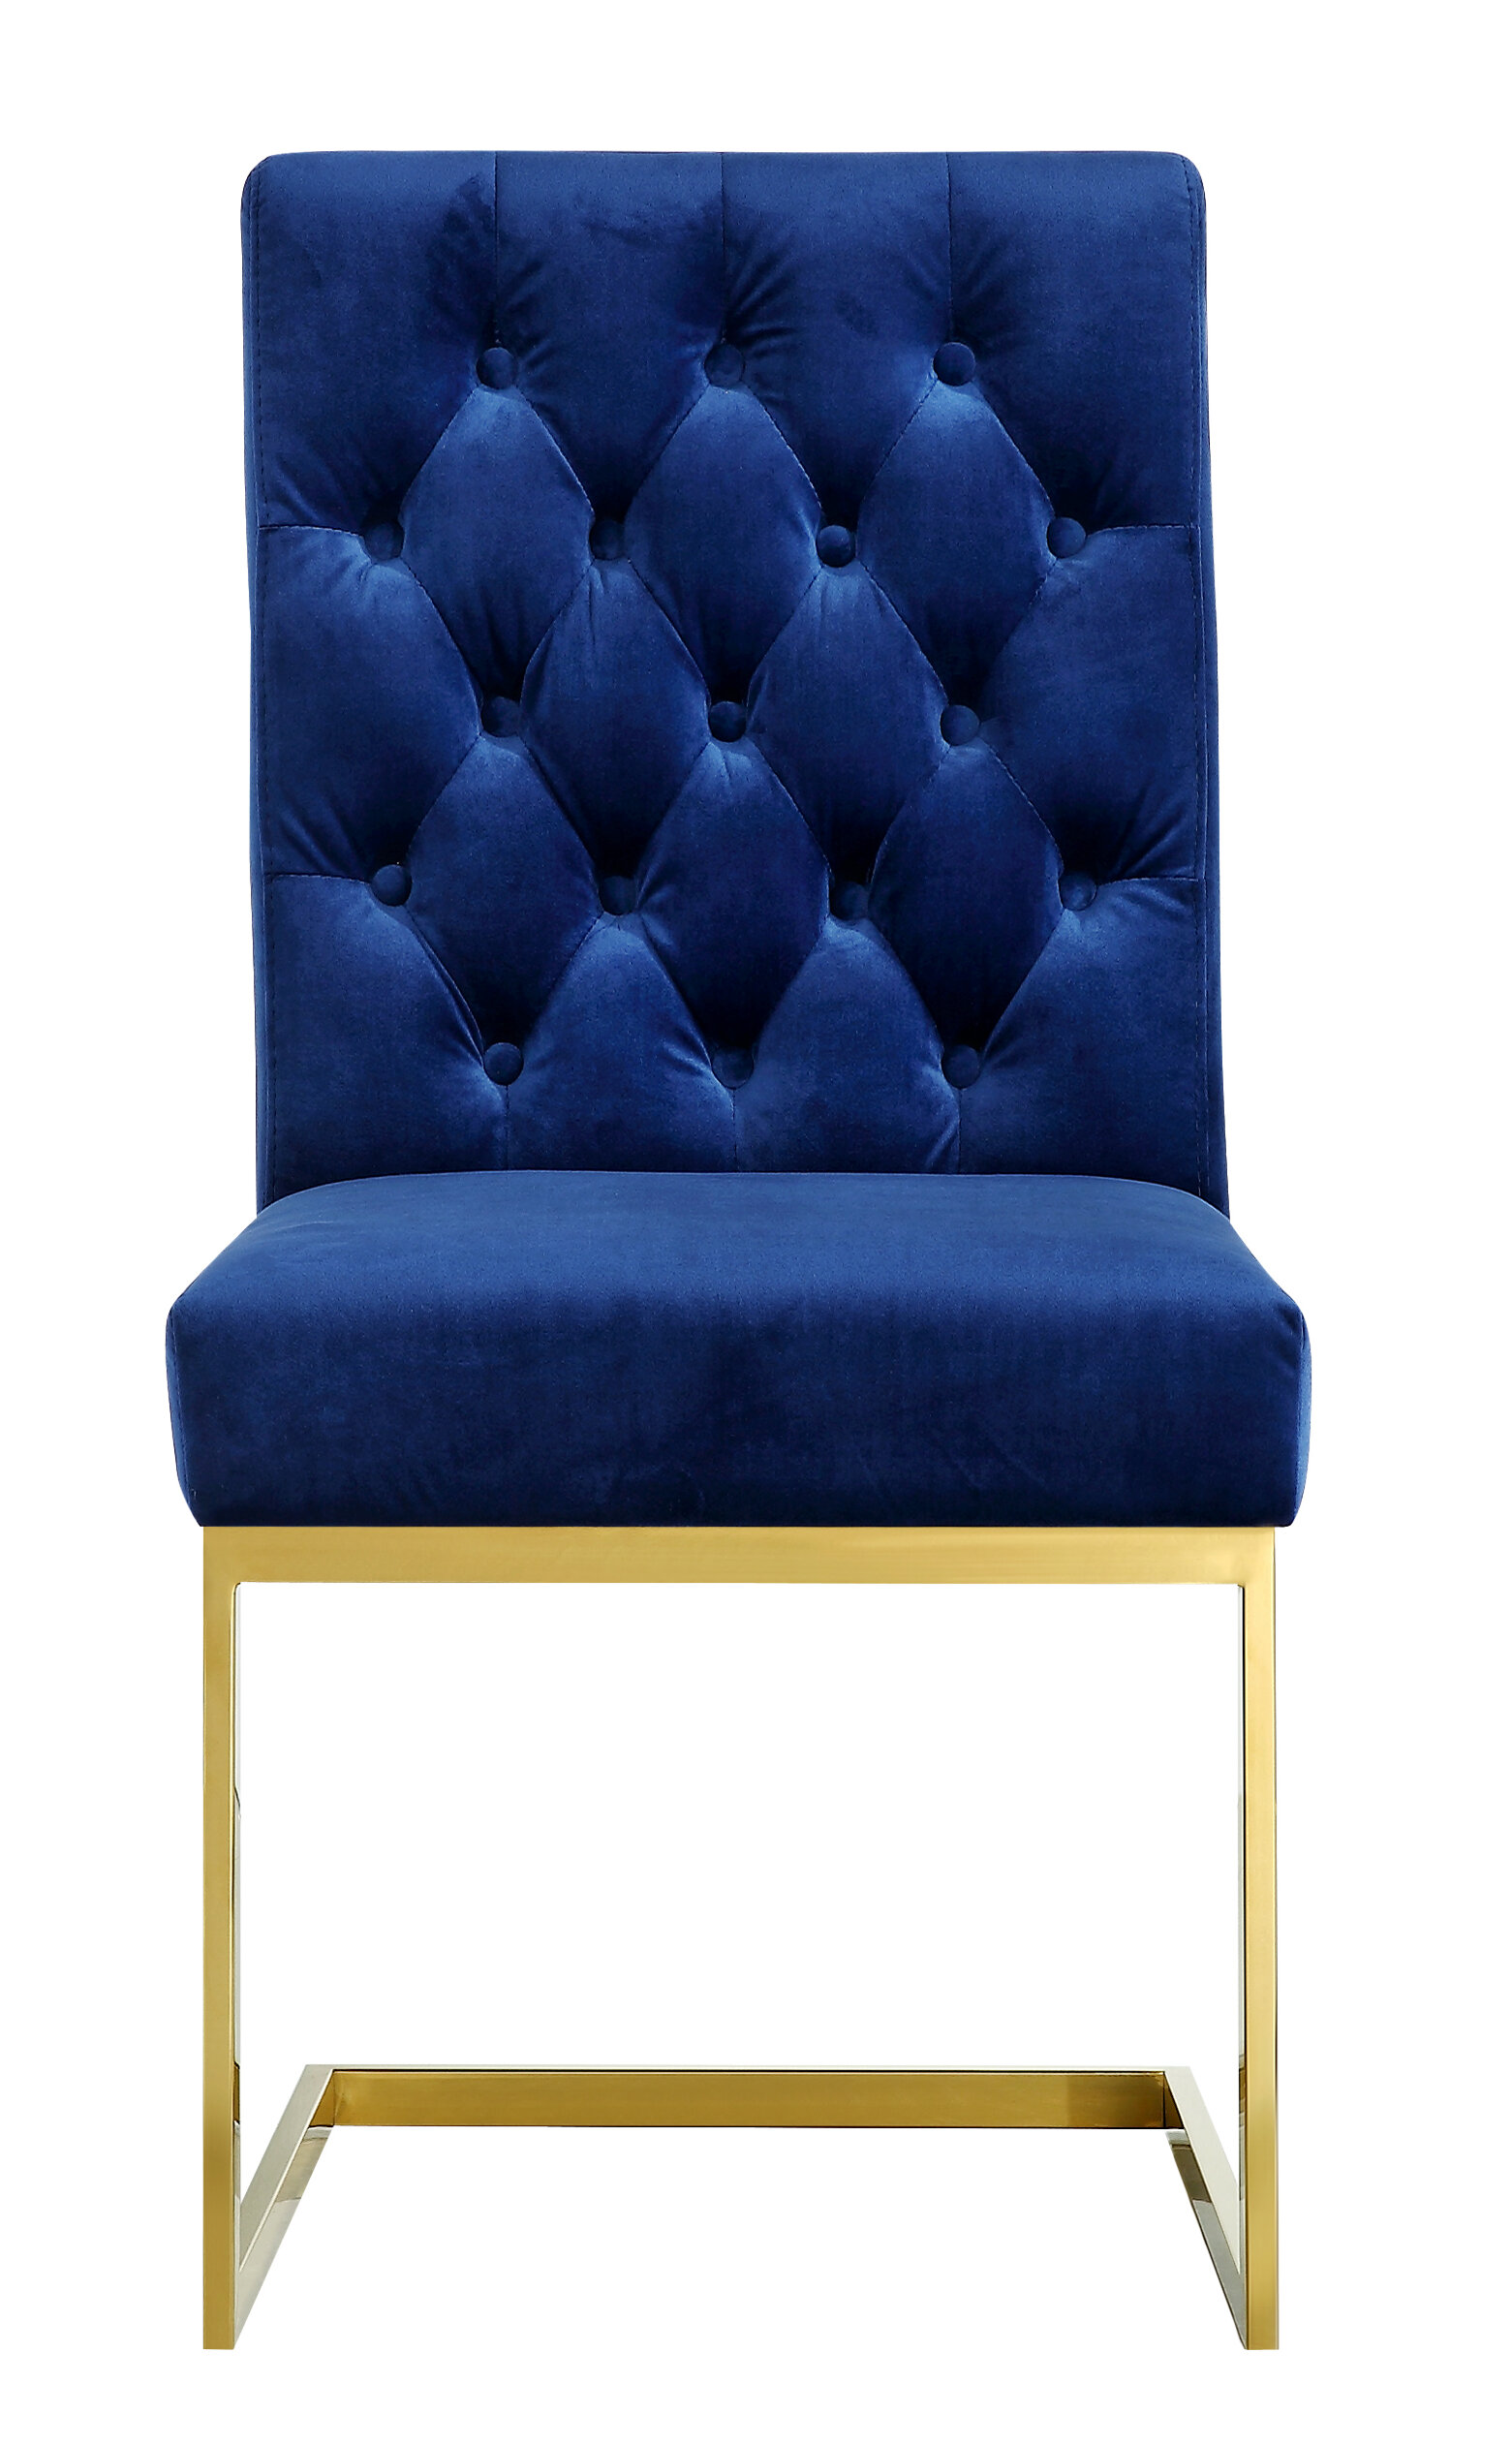 Willa Arlo Interiors Germana Upholstered Dining Chair